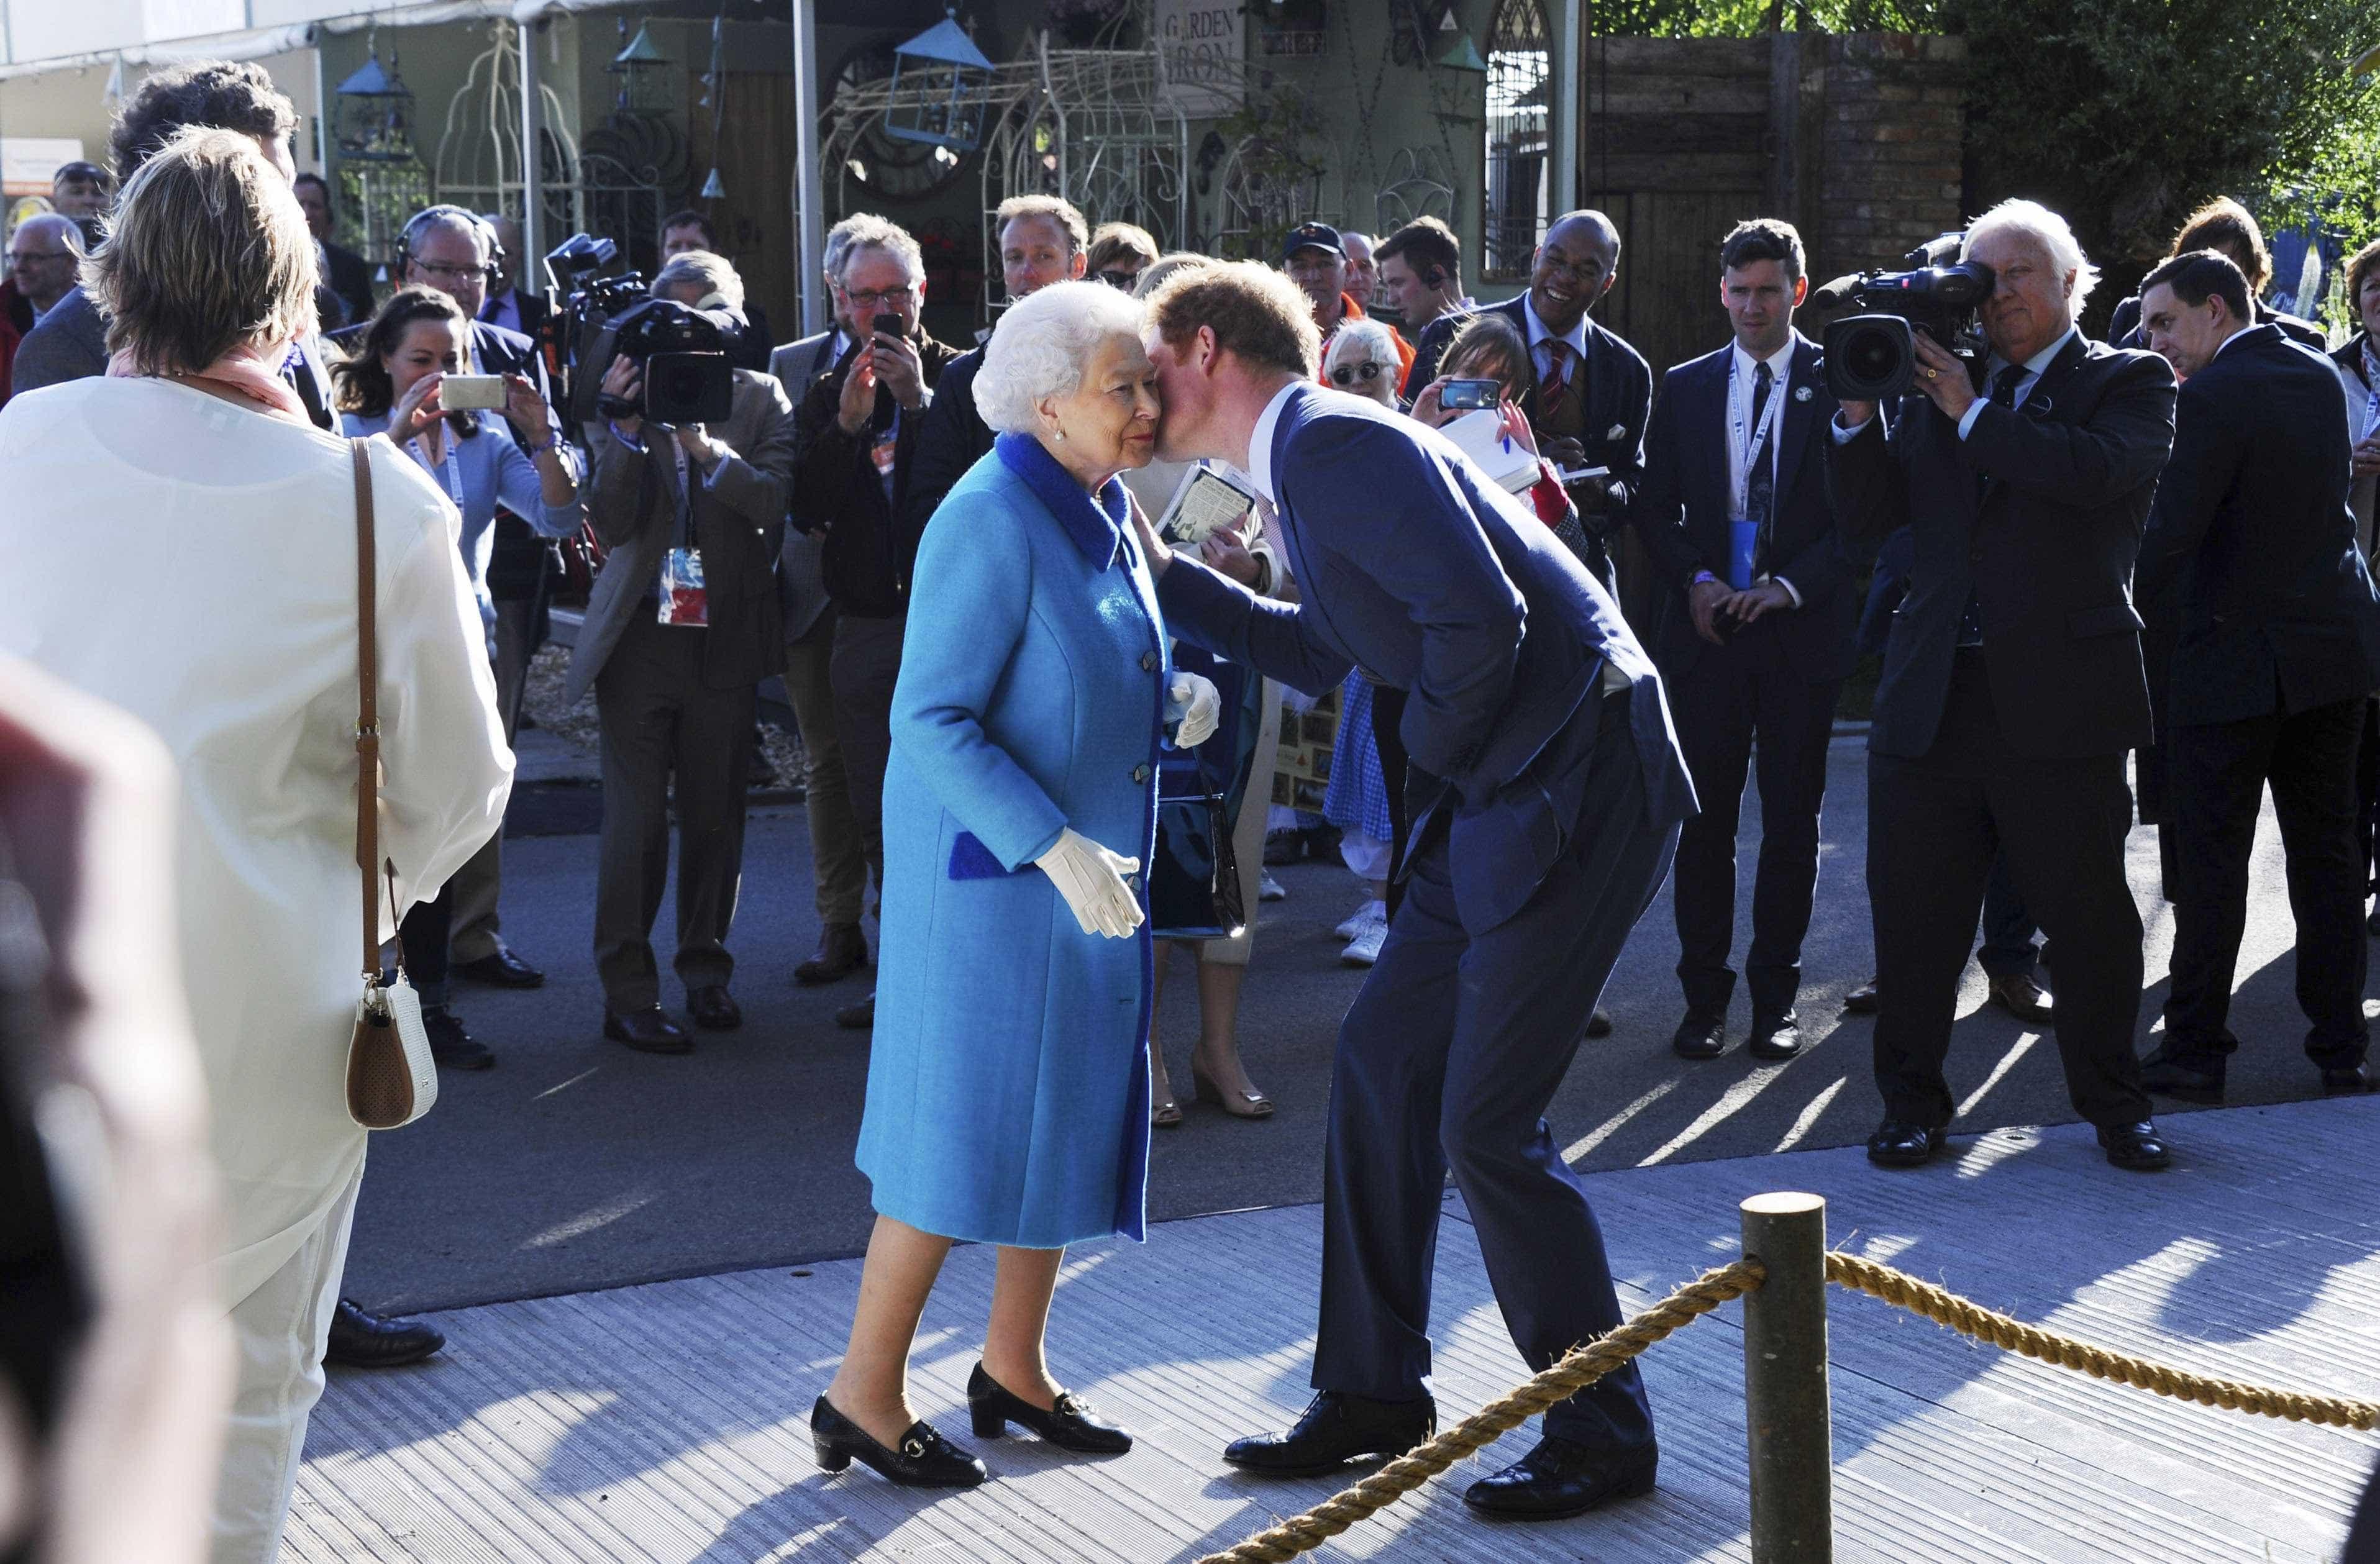 Príncipe Harry condecorado Cavaleiro Real